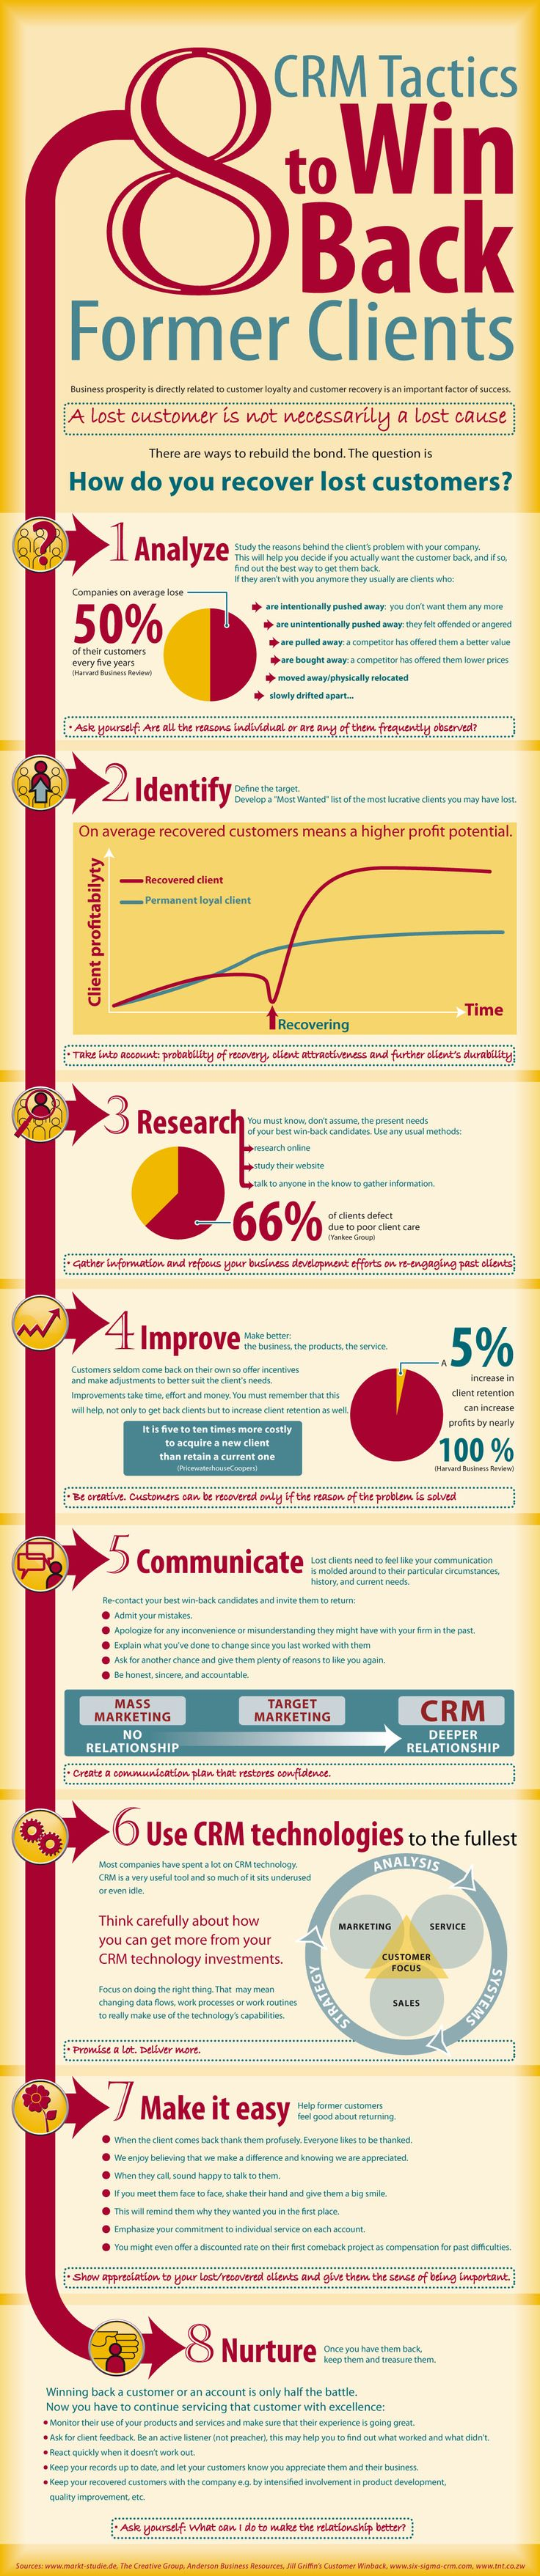 customer relationship marketing tactics by sales